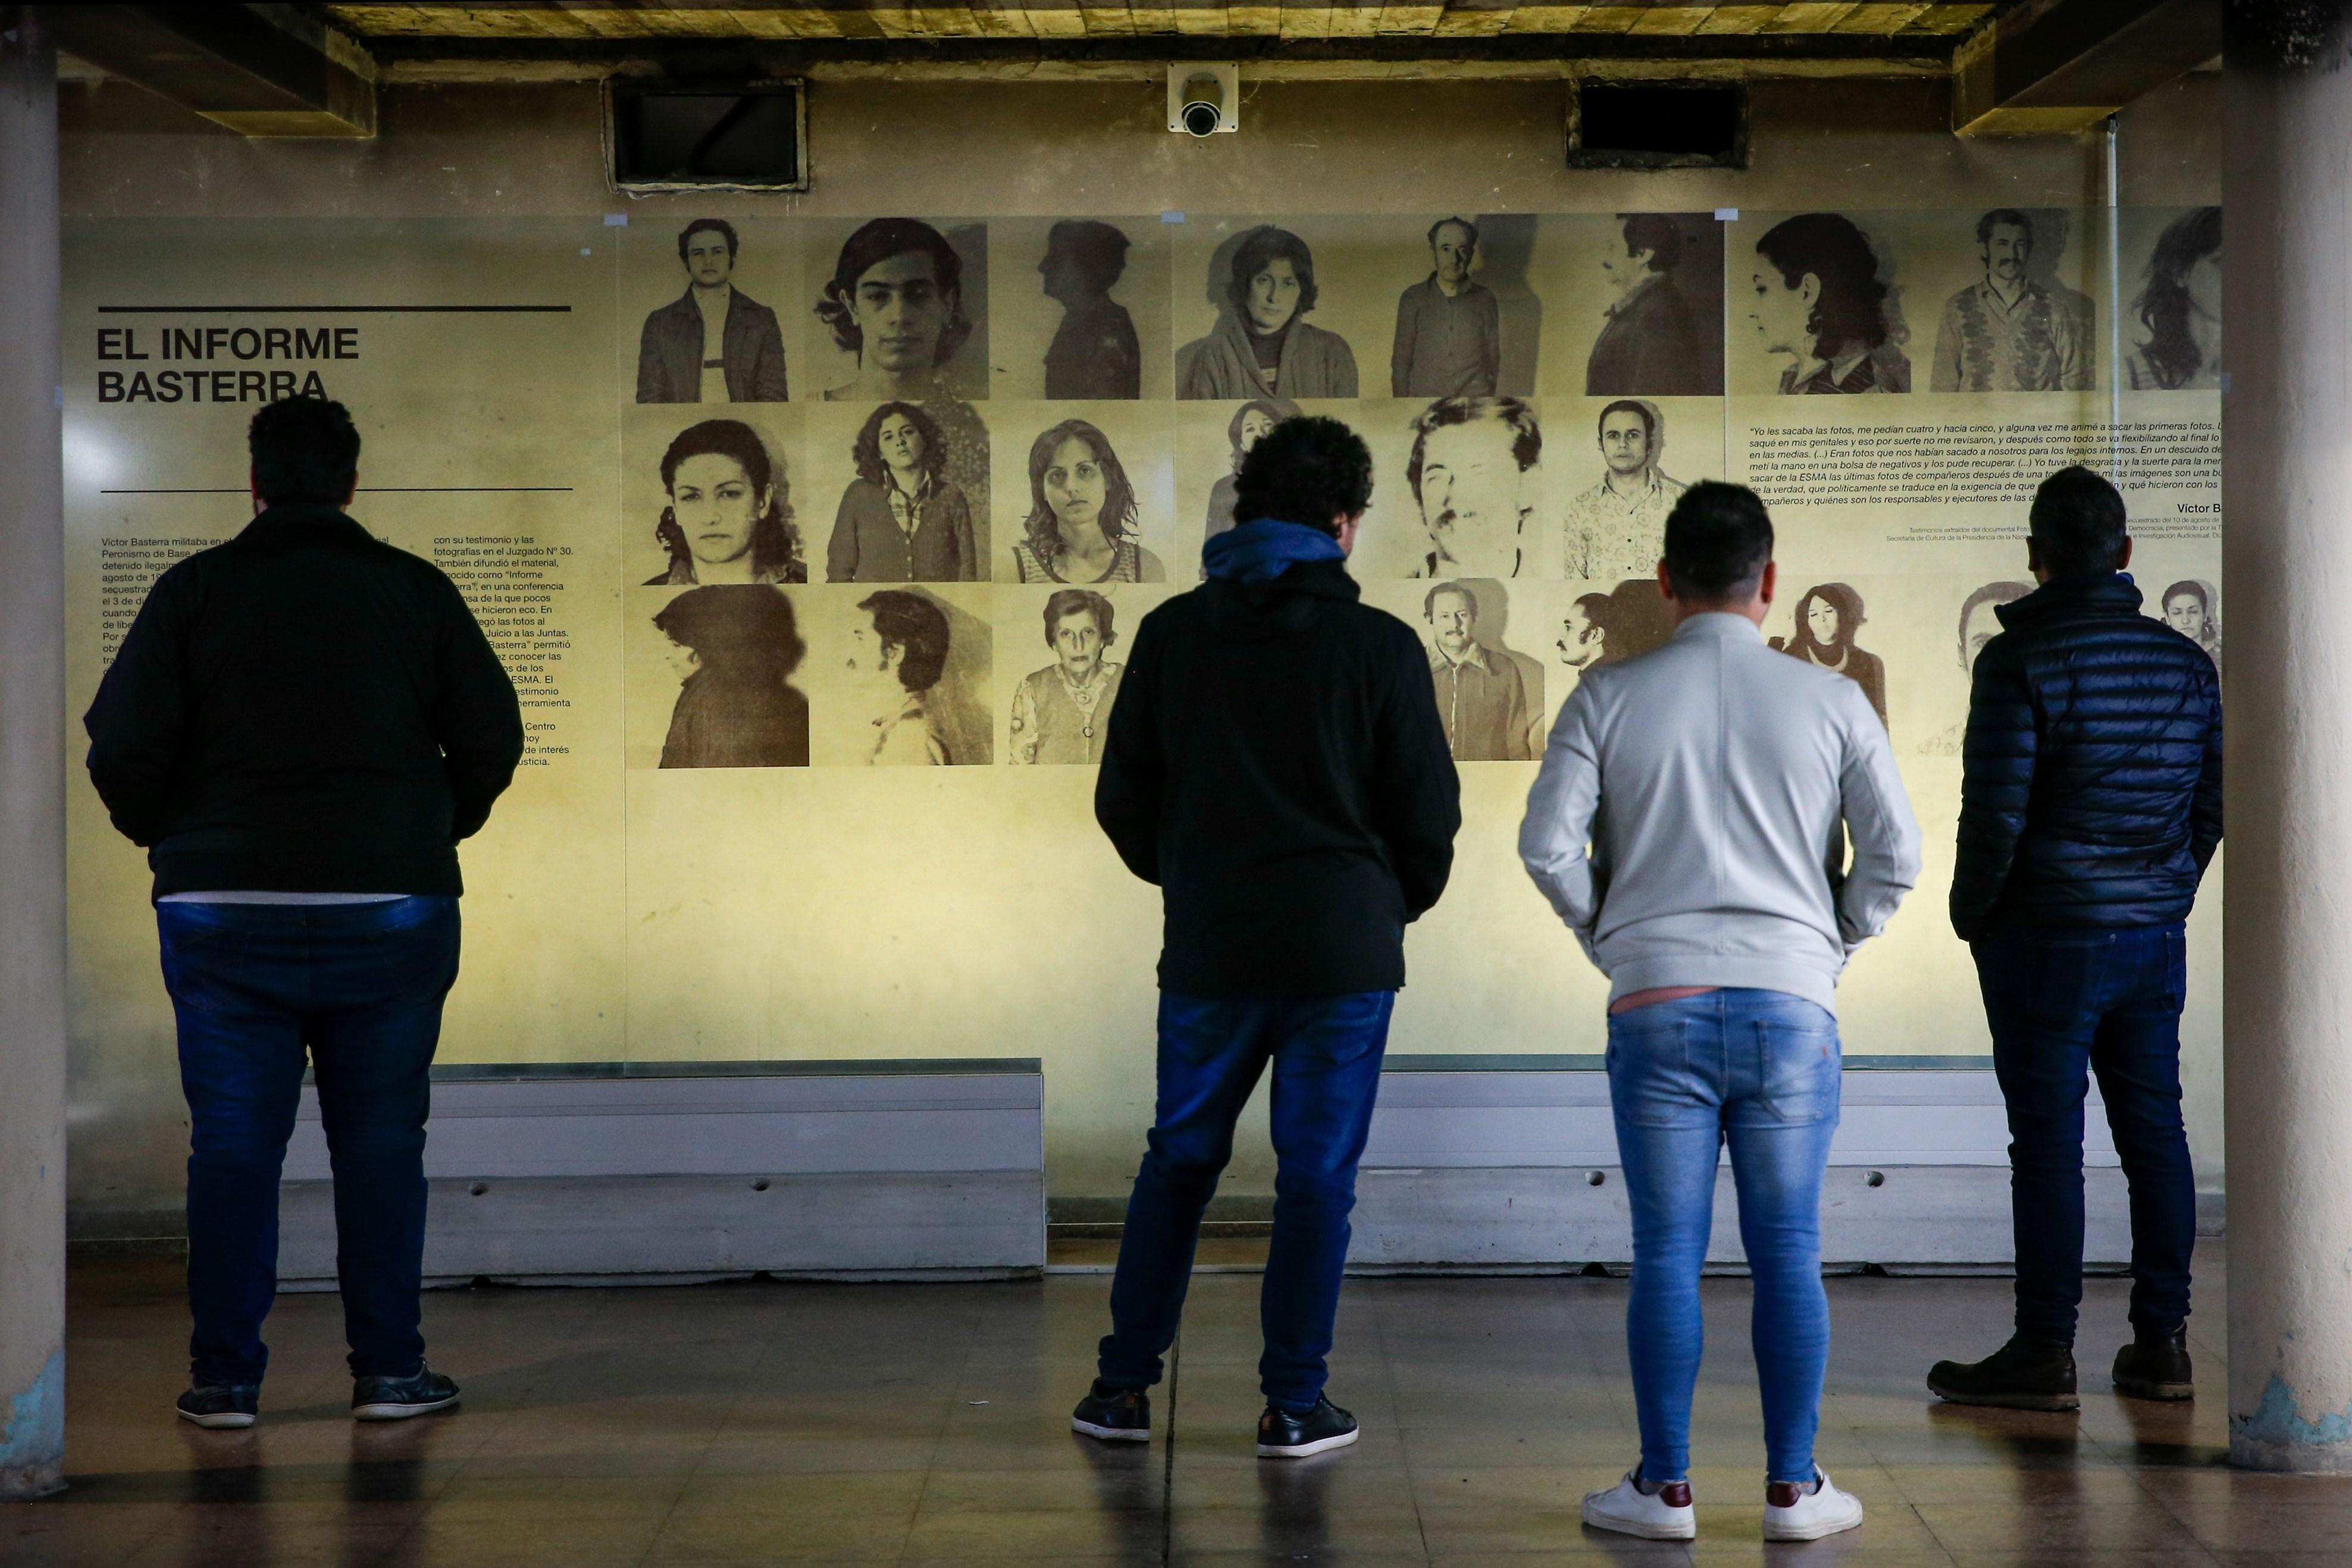 075c2e6eb3 Excentro de tortura argentino refuerza candidatura a Patrimonio Mundial